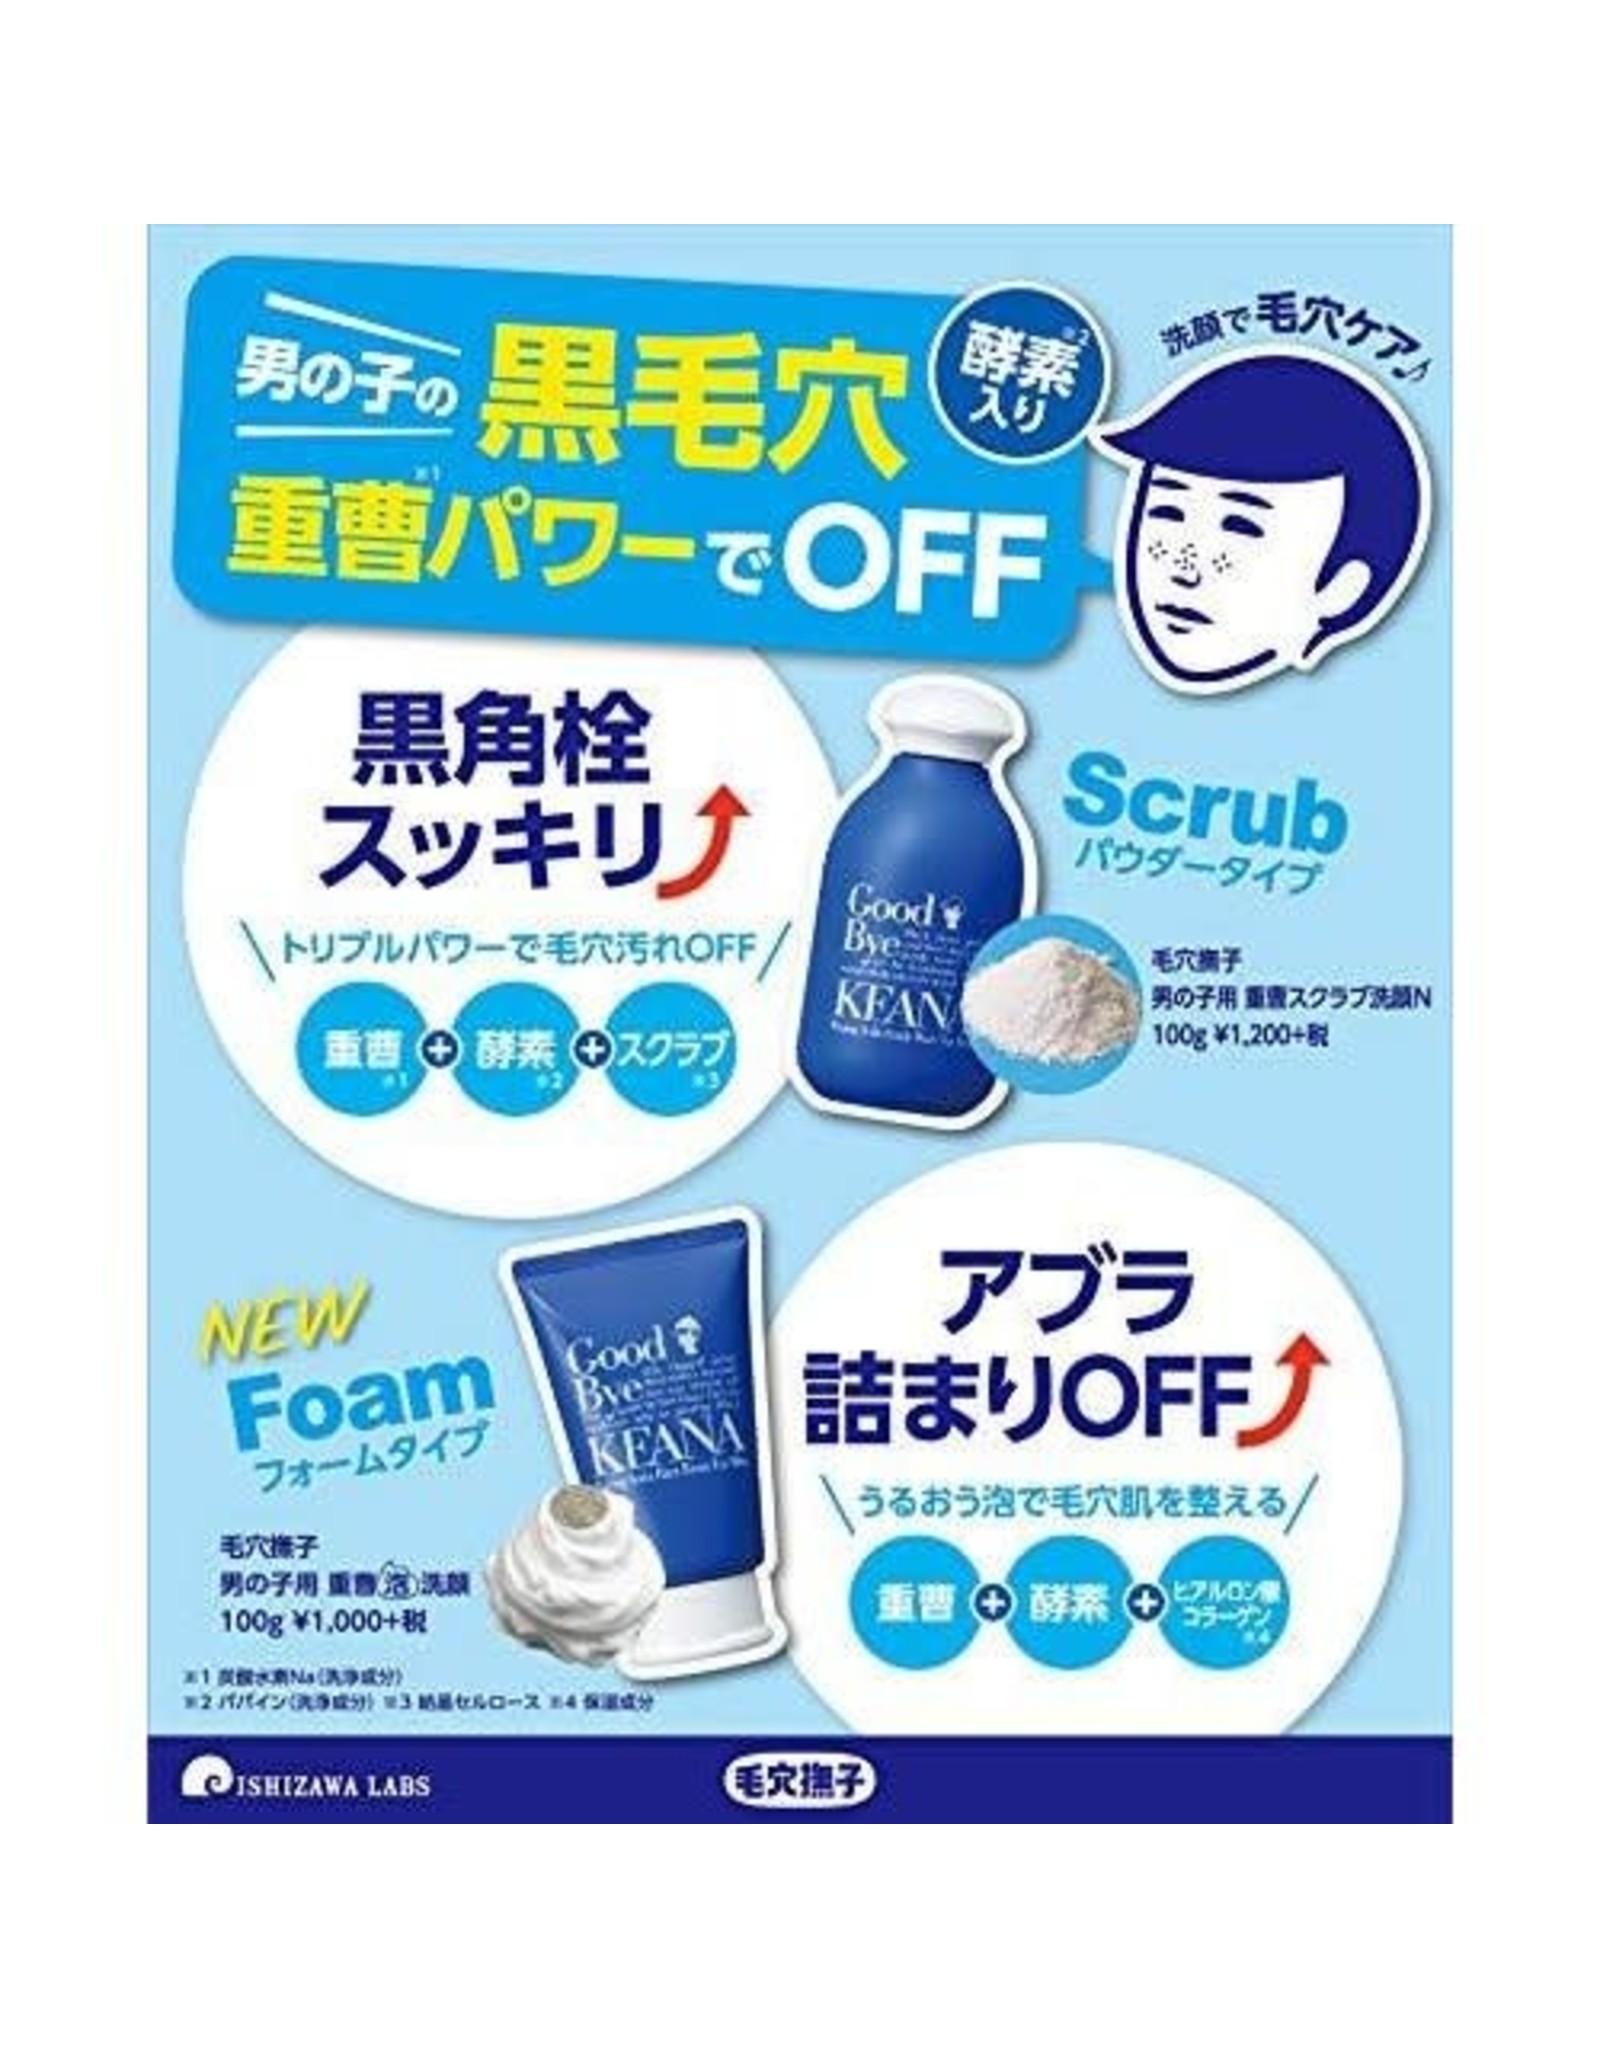 Ishizawa Lab Ishizawa  Keana Nadeshiko Baking Soda Face Foam For Men